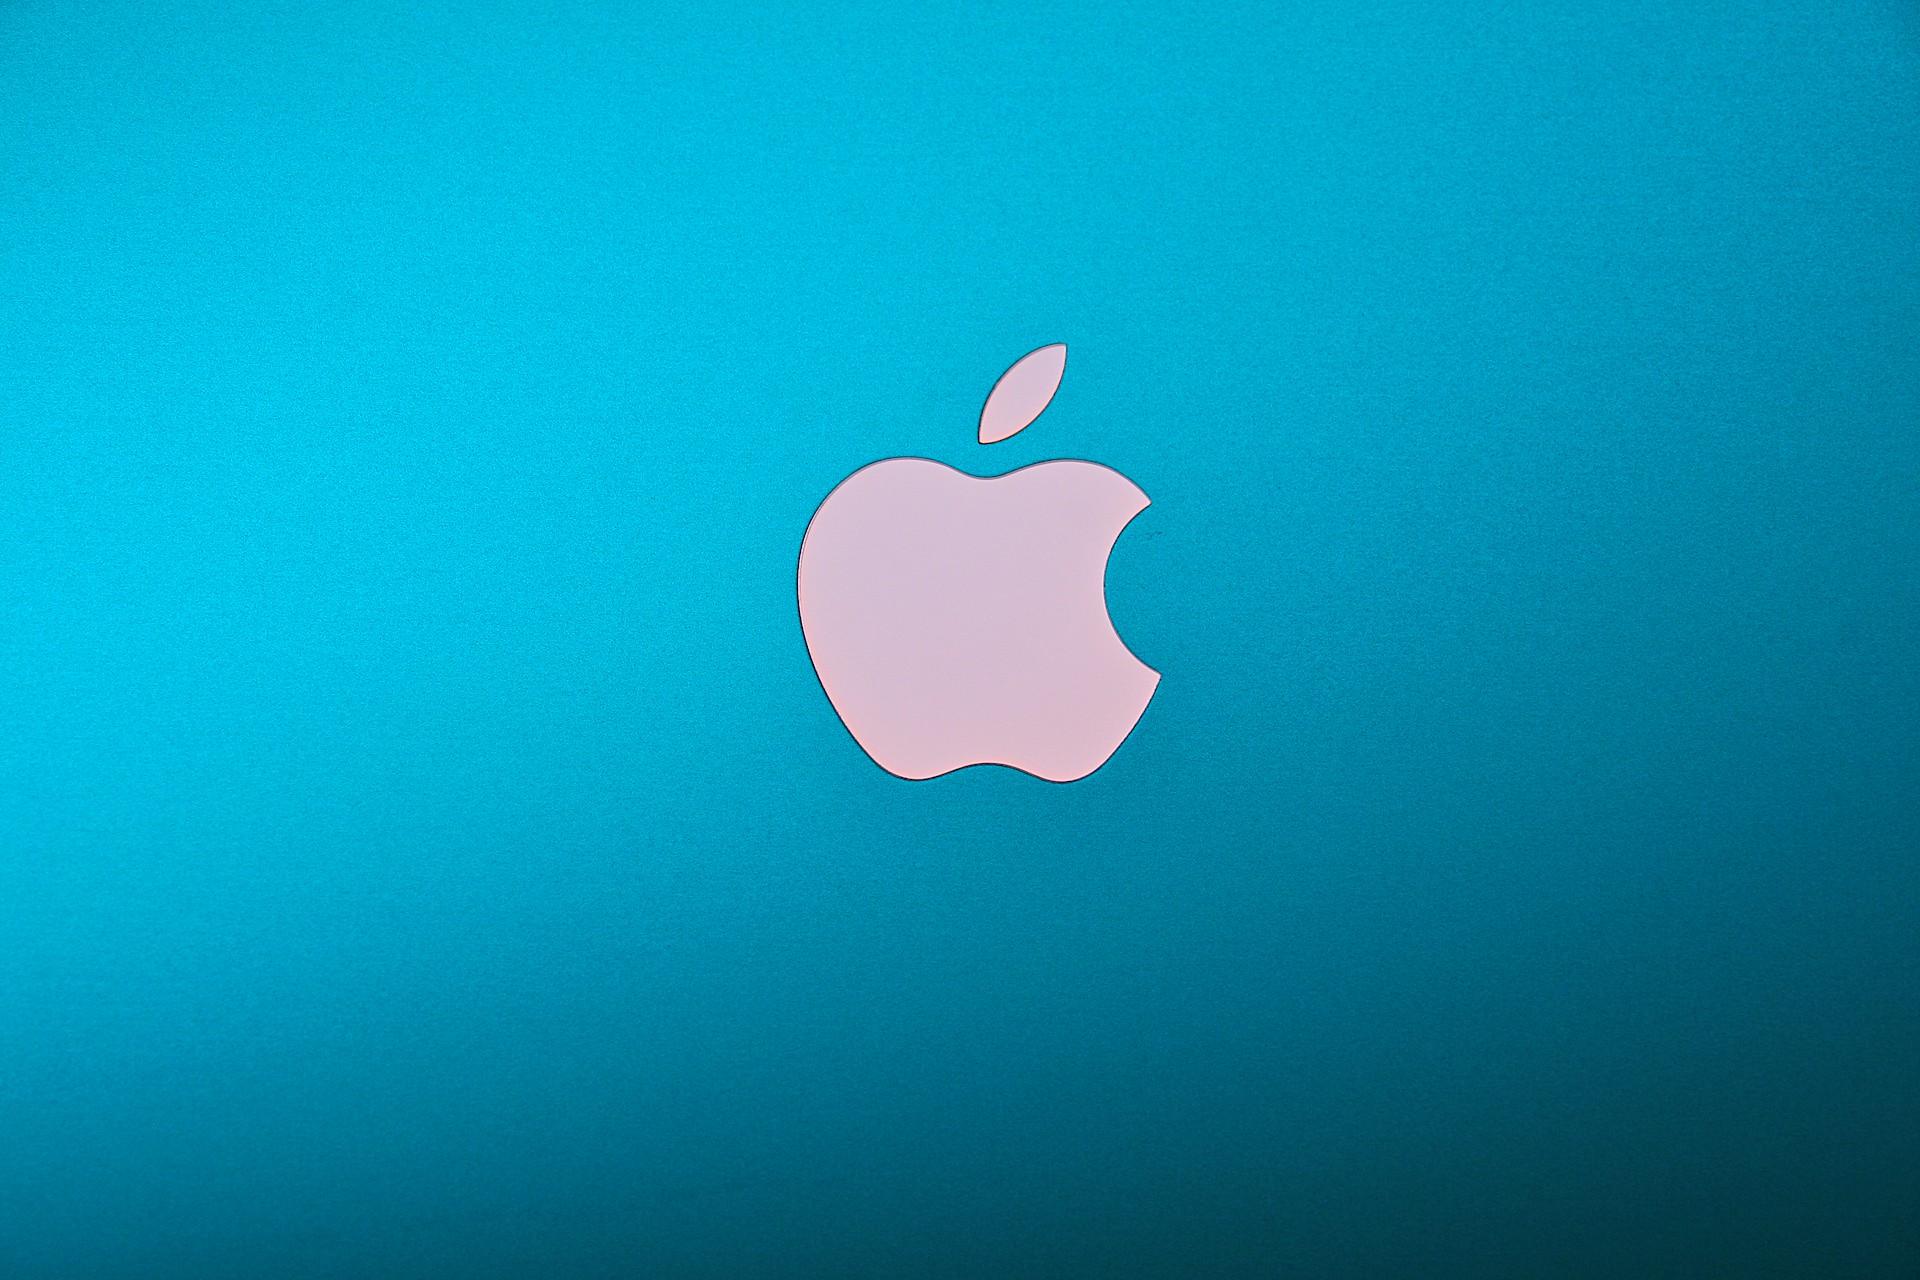 Apple MacBook Pro Color